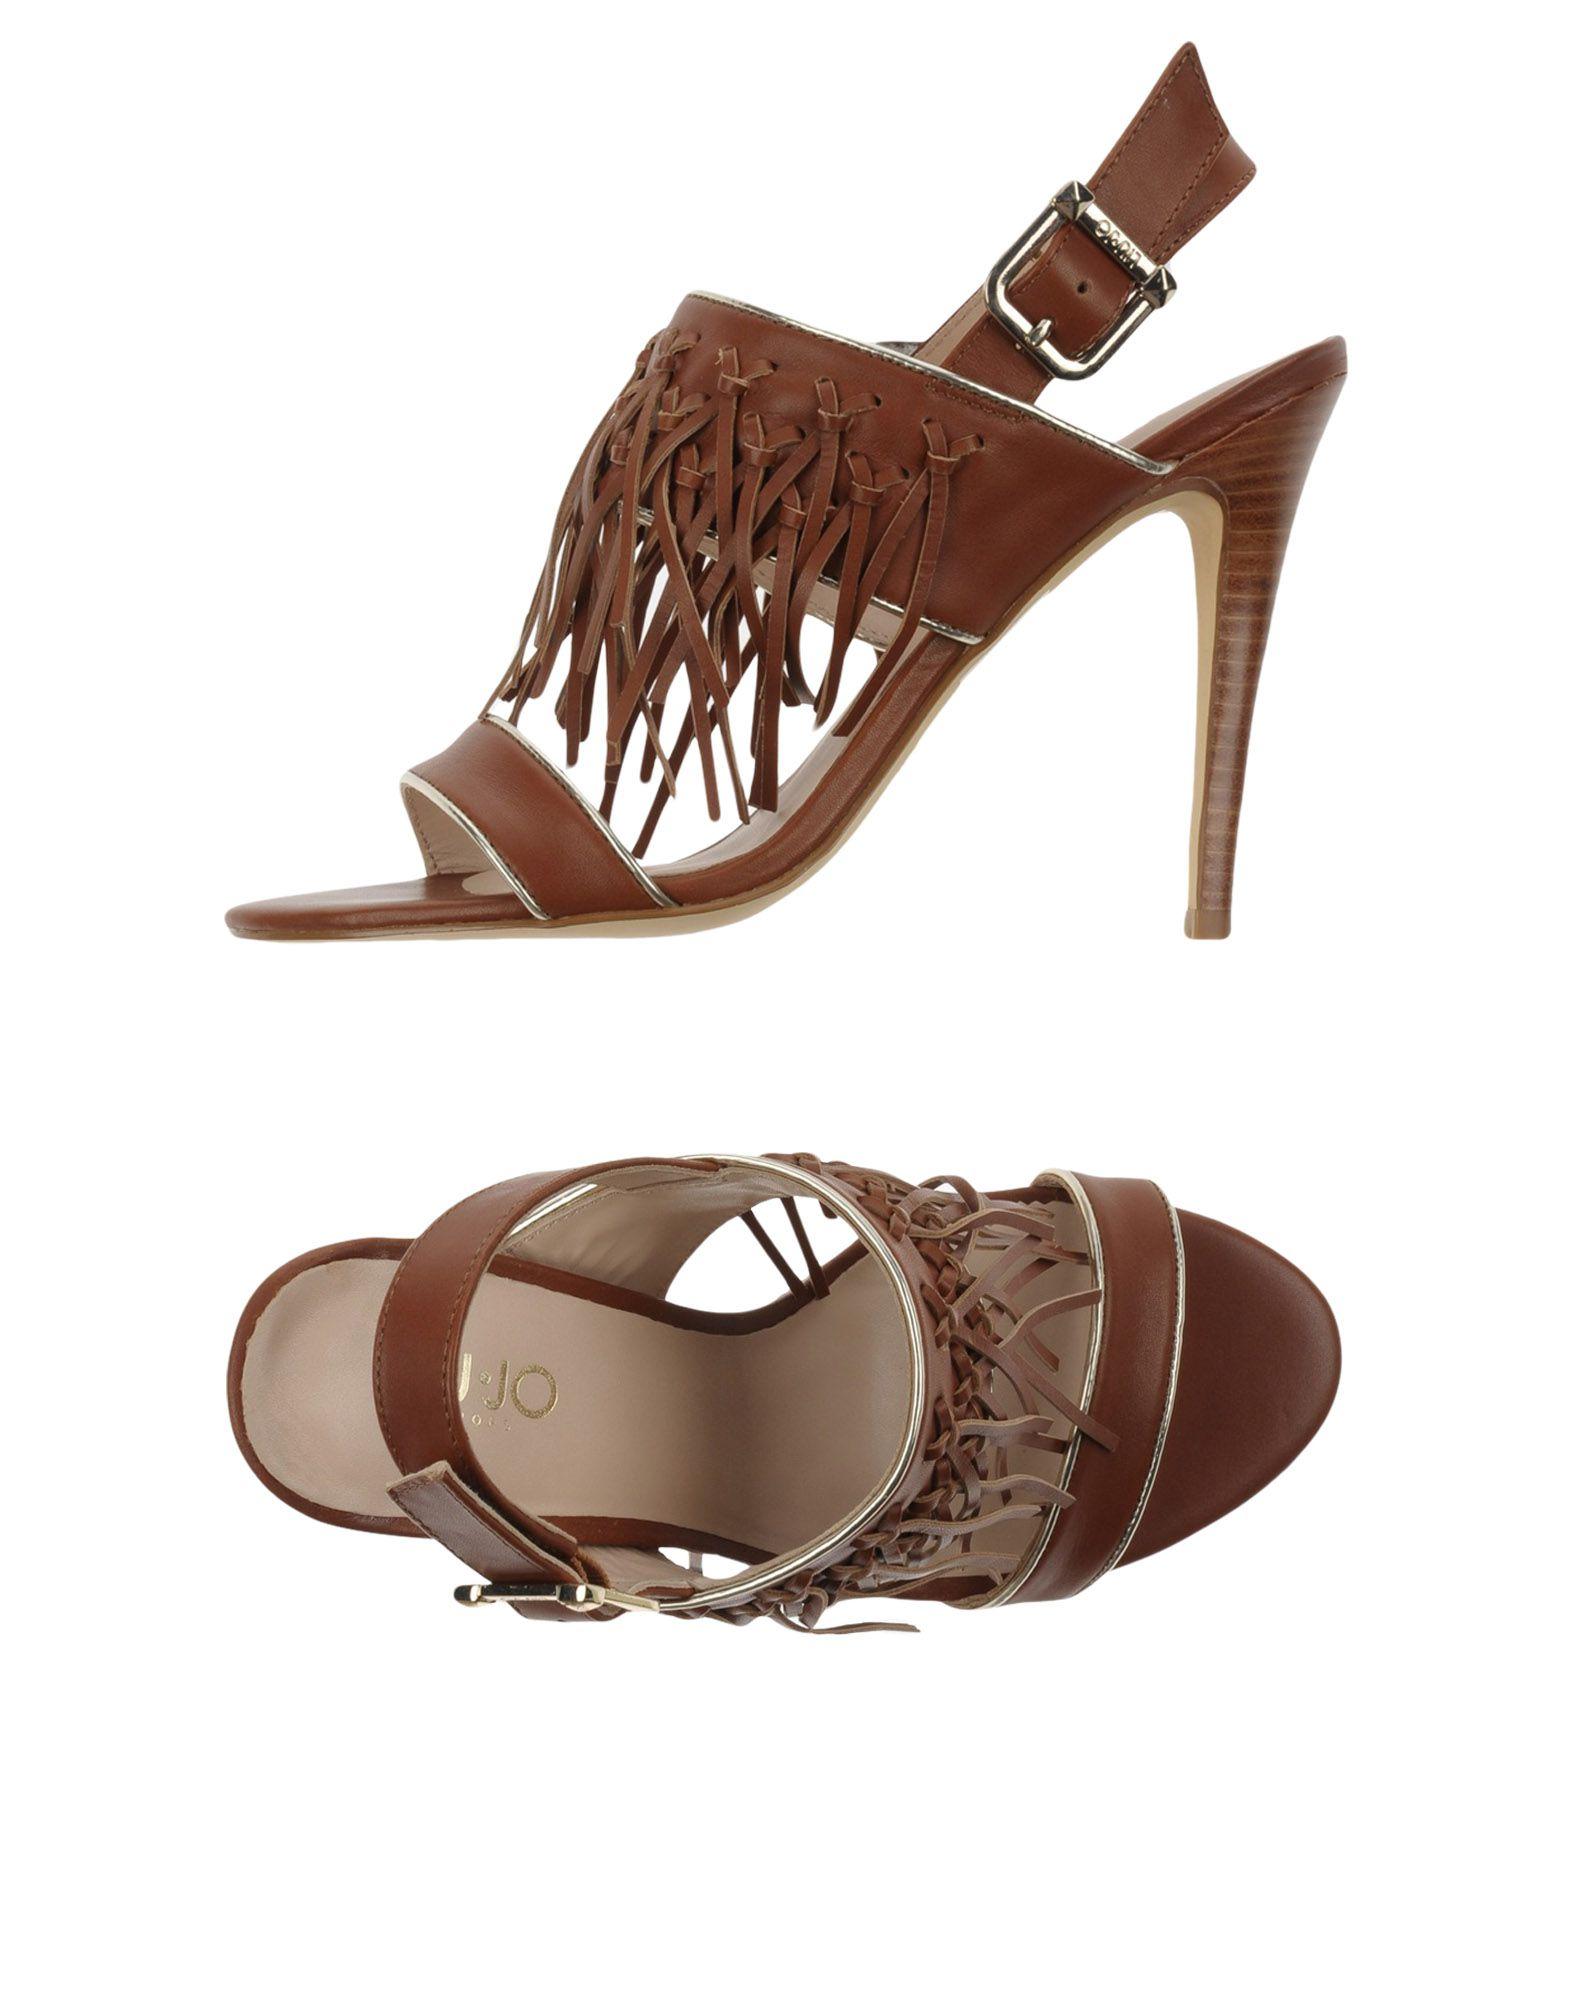 LIU •JO Сандалии liu •jo shoes сандалии page 3